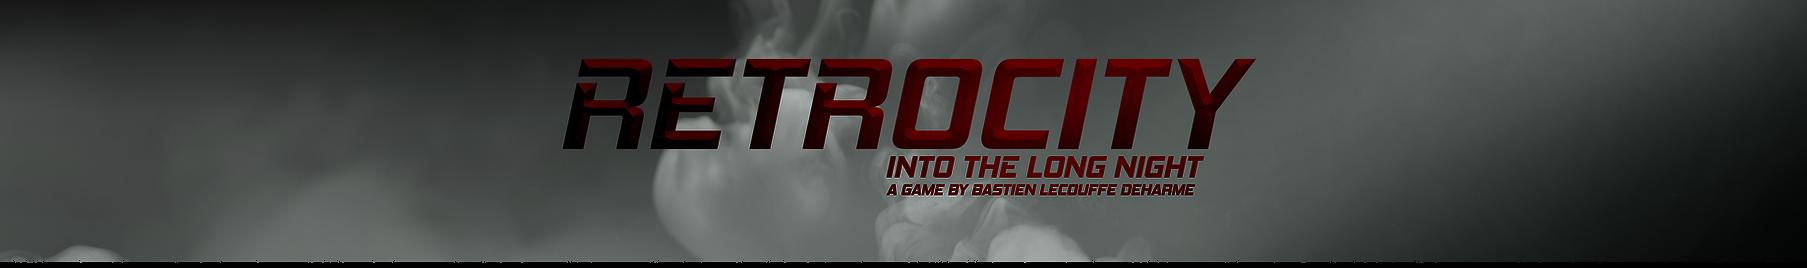 Retrocity-smokes-website.png